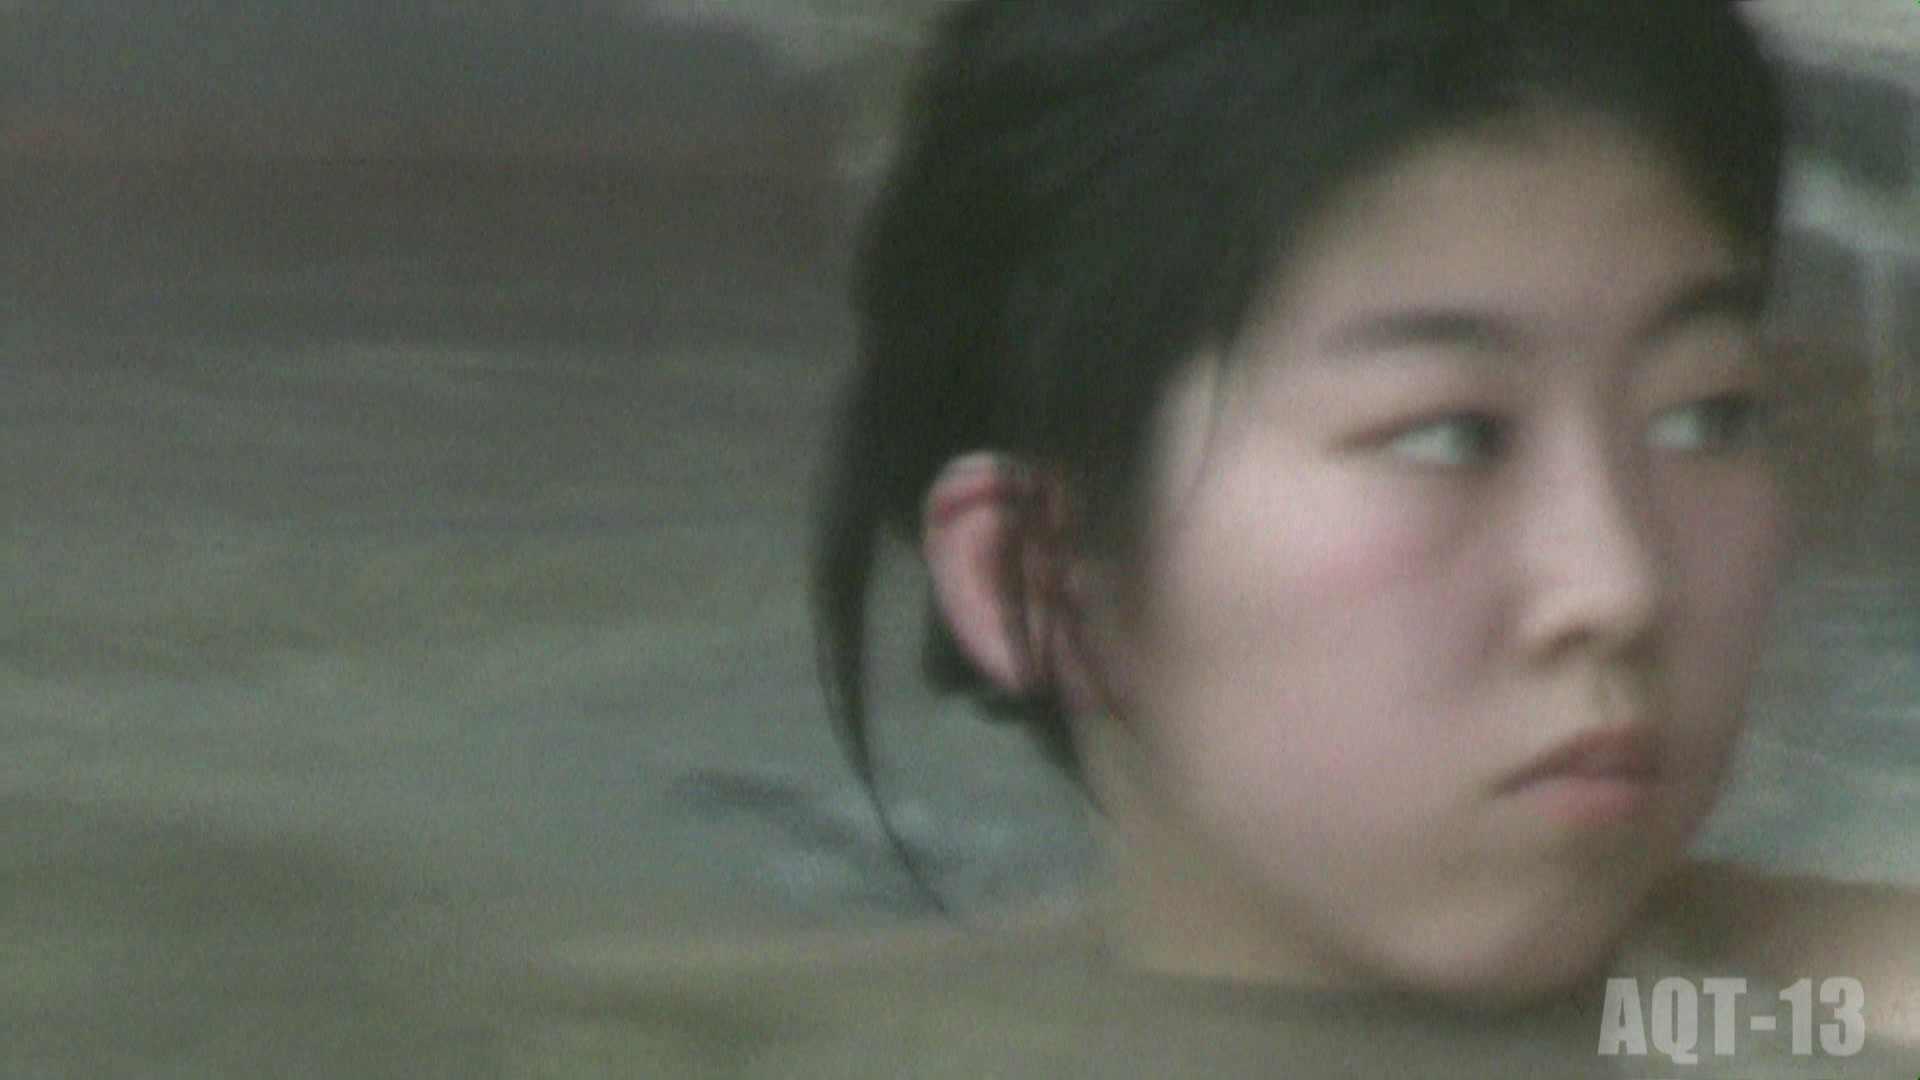 Aquaな露天風呂Vol.816 OLのエロ生活 | 露天風呂  90連発 16